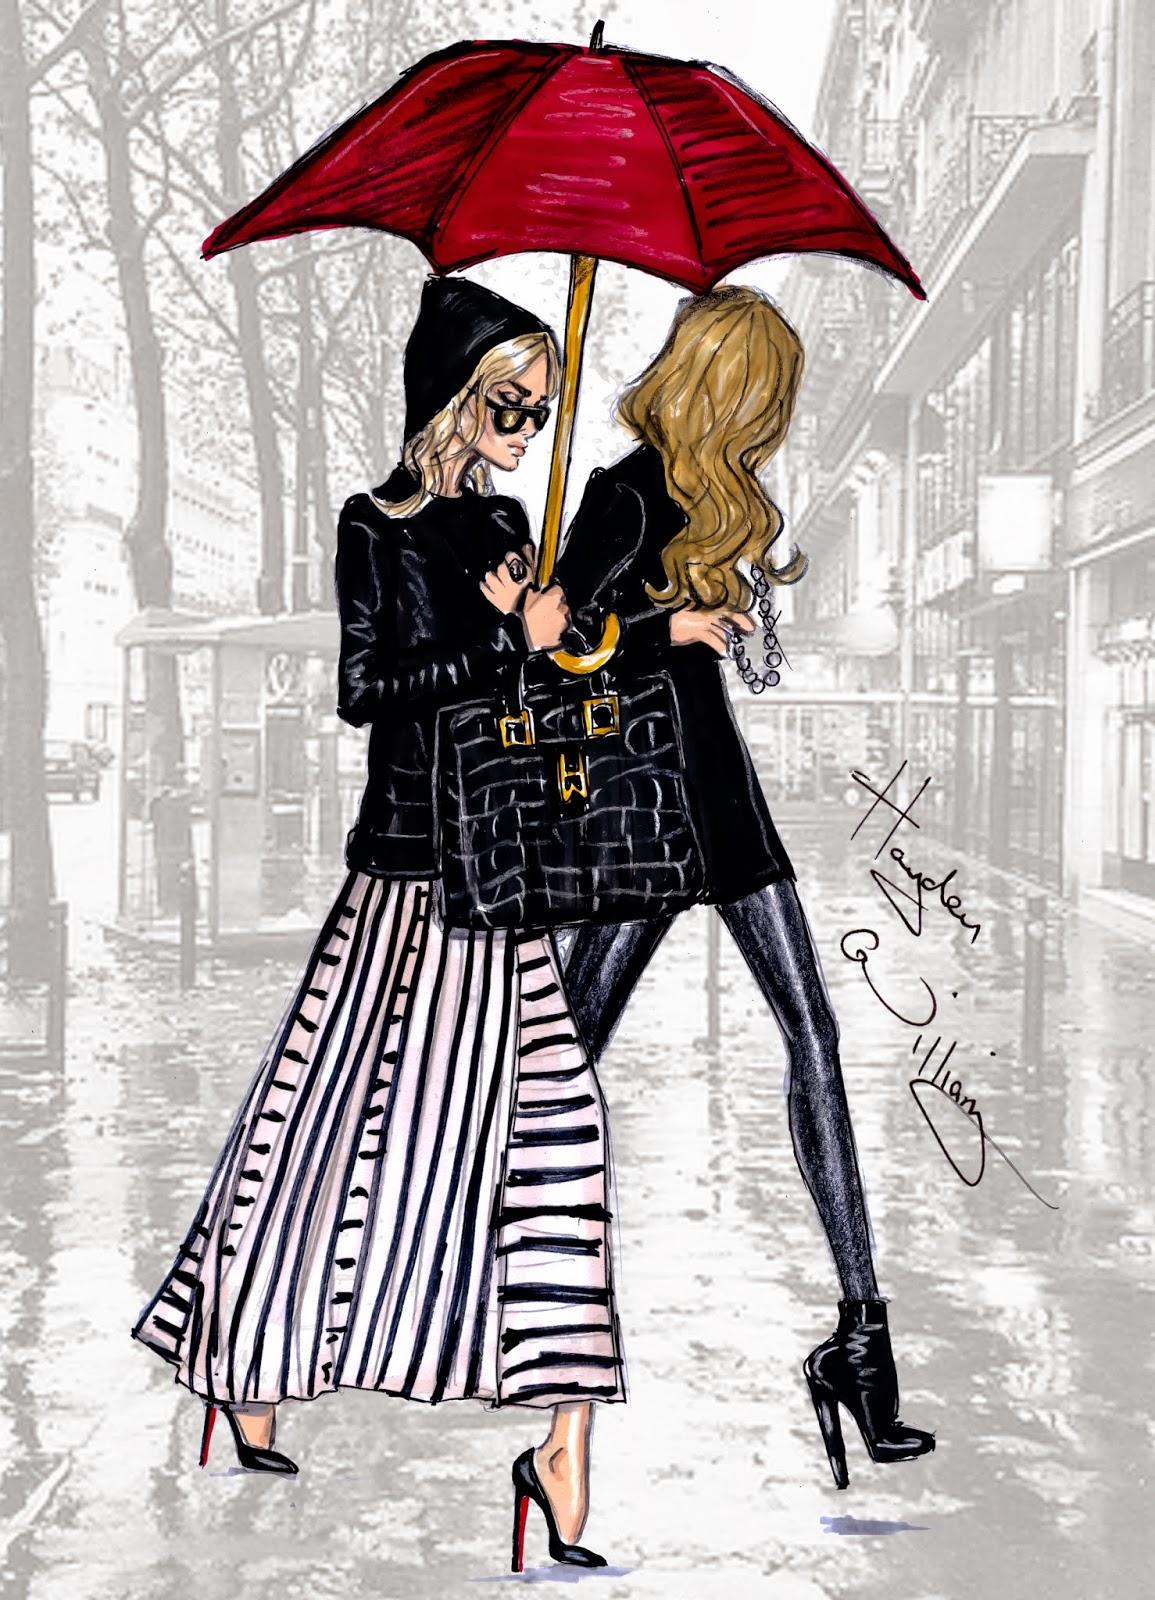 Hayden Williams Fashion Illustrations: 'The Olsen's in ...